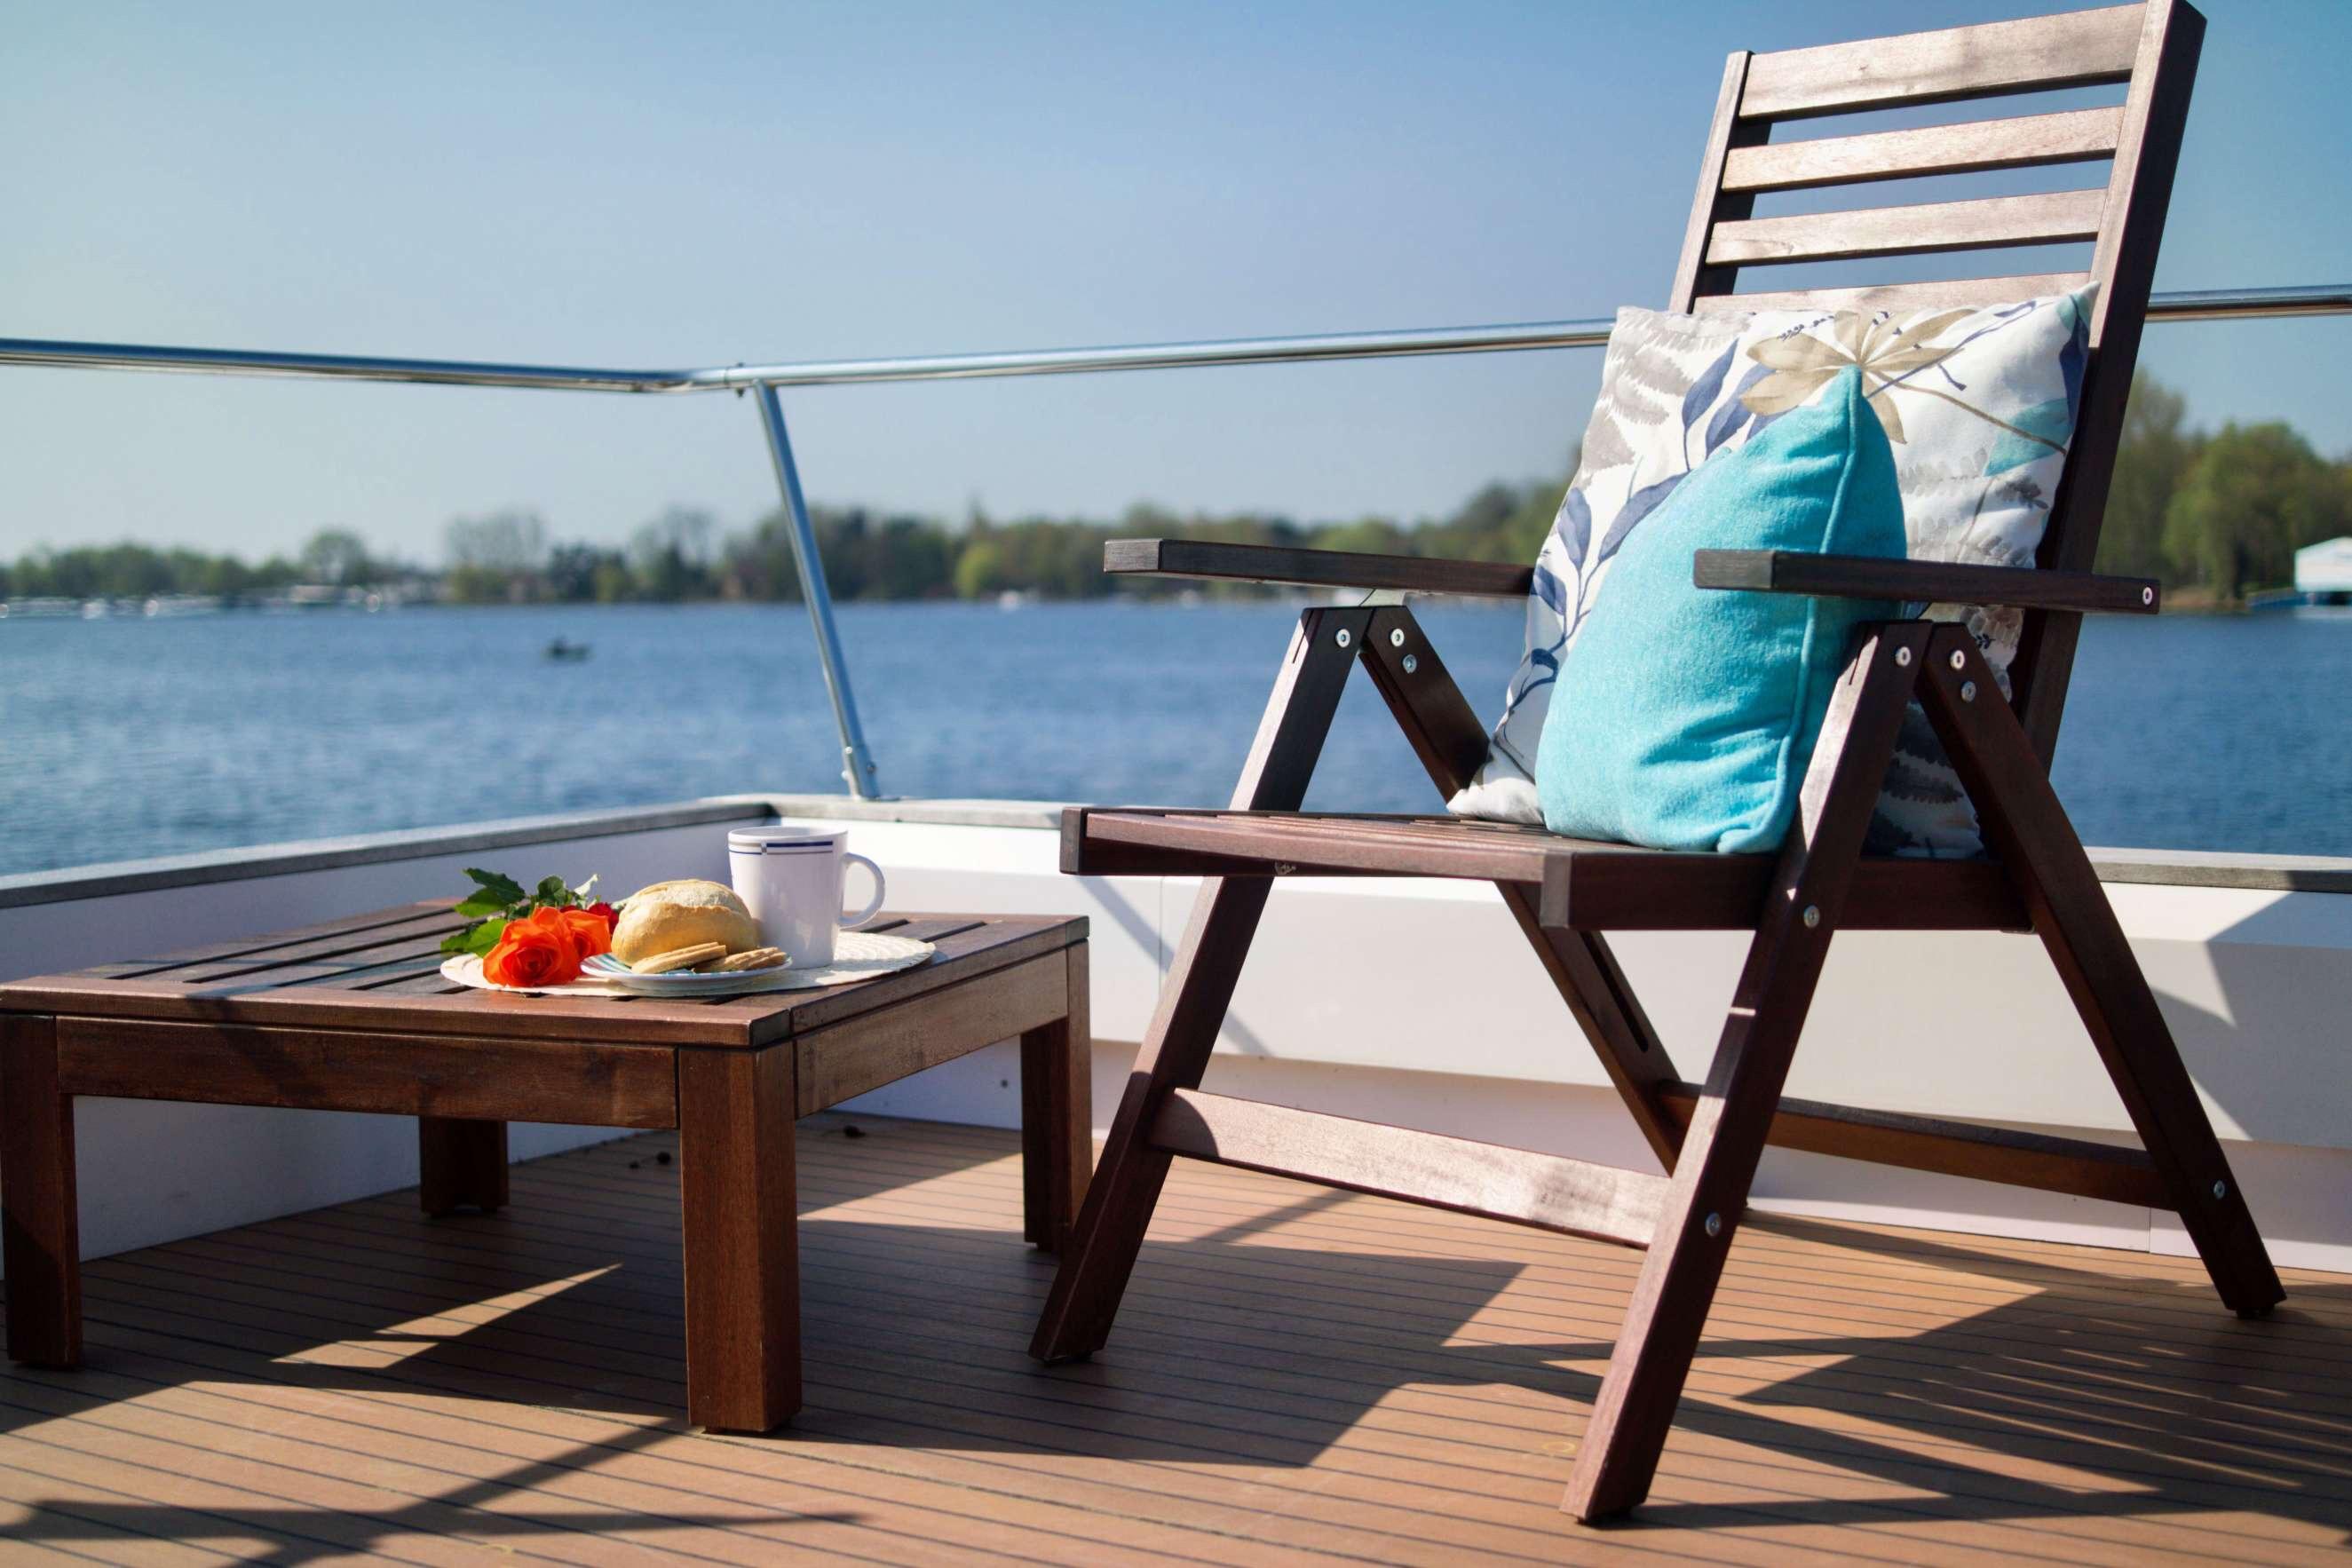 hausboot edelweiss hausboot mieten hausboot charter hausboot kaufen in brandeburg havel. Black Bedroom Furniture Sets. Home Design Ideas